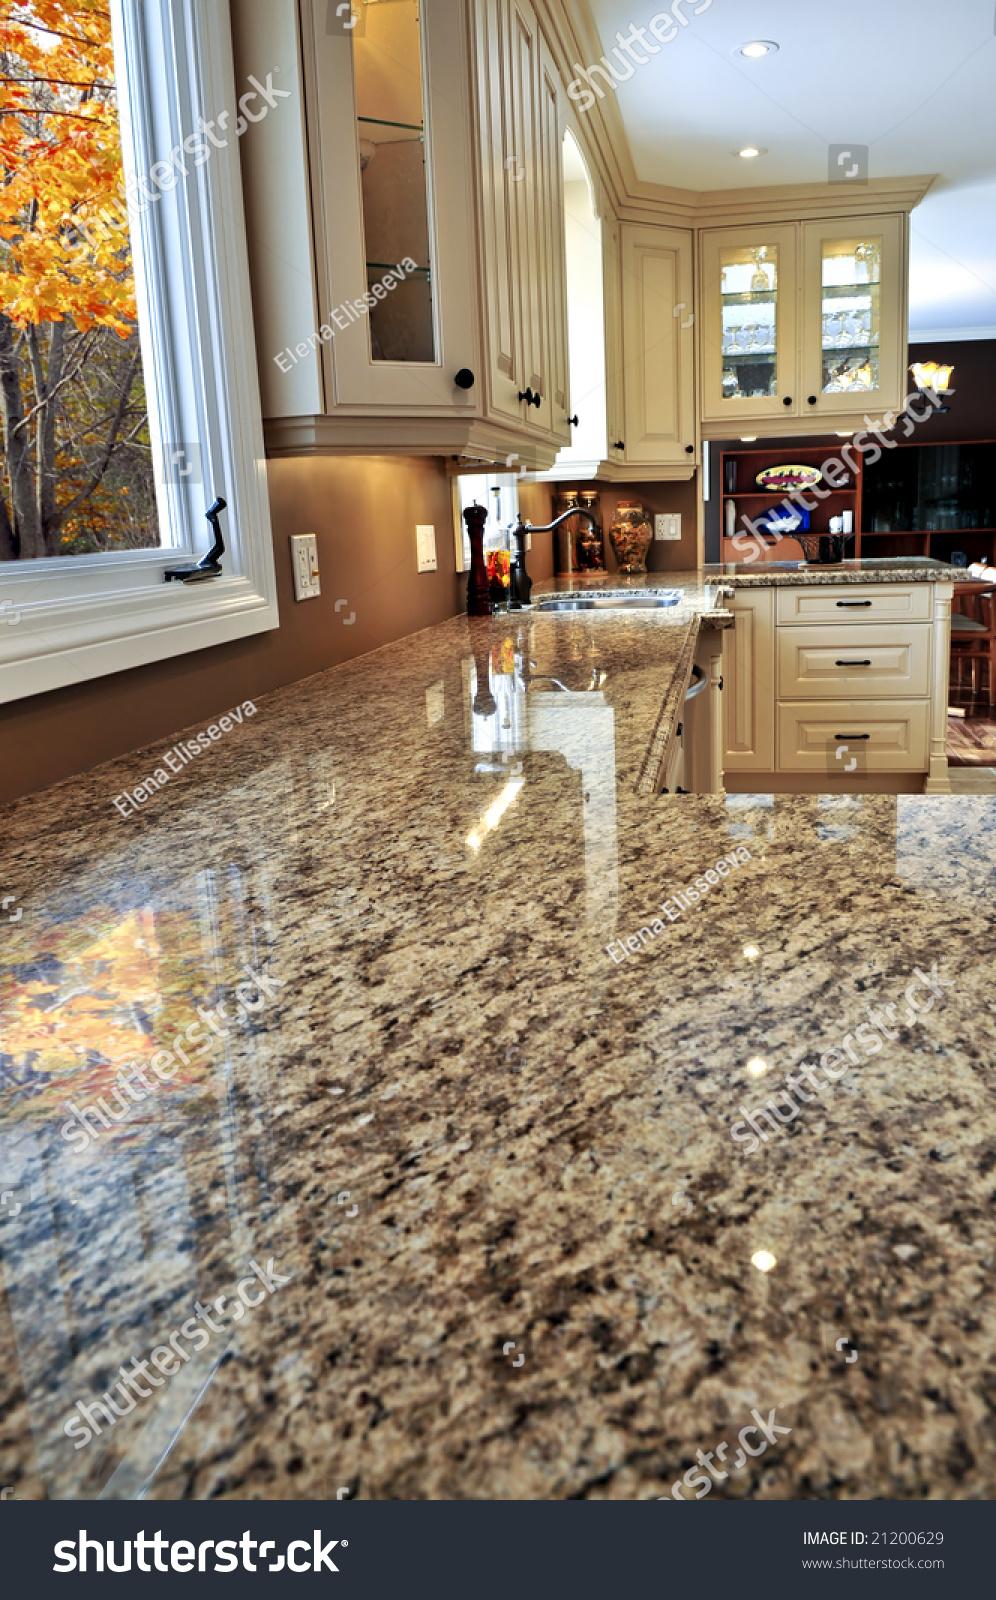 Modern luxury kitchen interior with granite countertop stock photo 21200629 shutterstock - Modern luxury kitchen with granite countertop ...